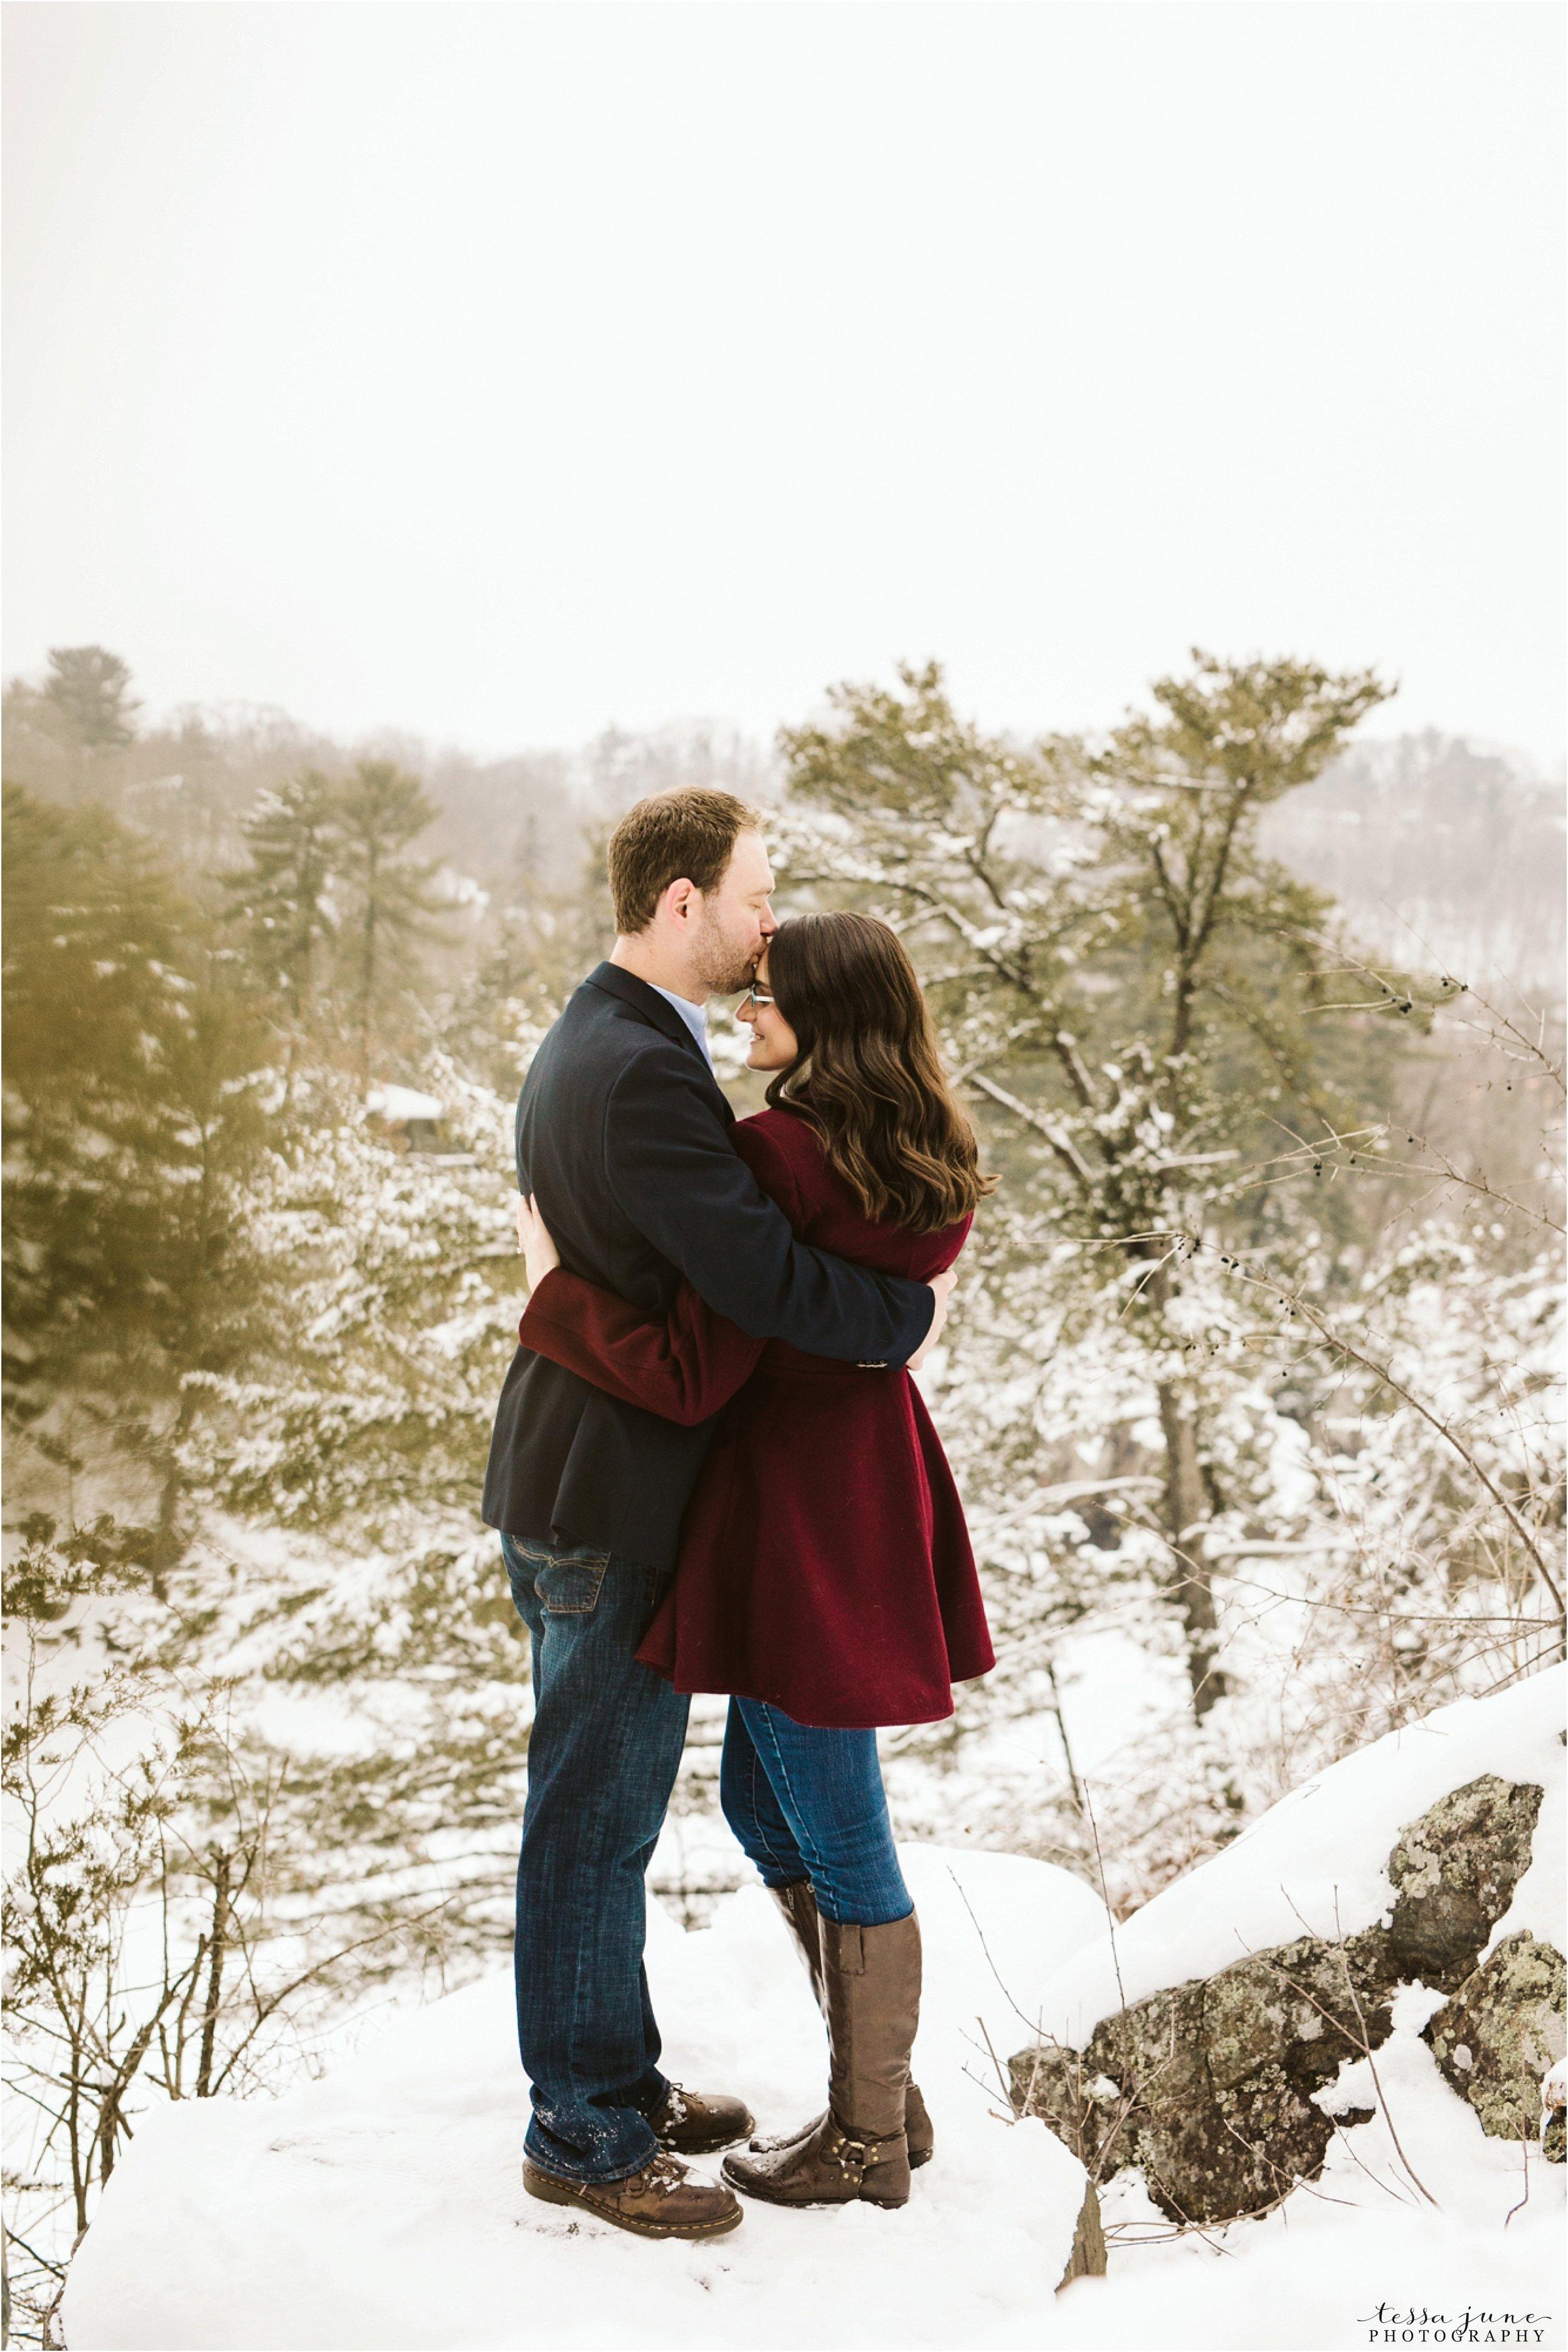 taylors-falls-winter-engagement-session-st-cloud-photographer-21.jpg